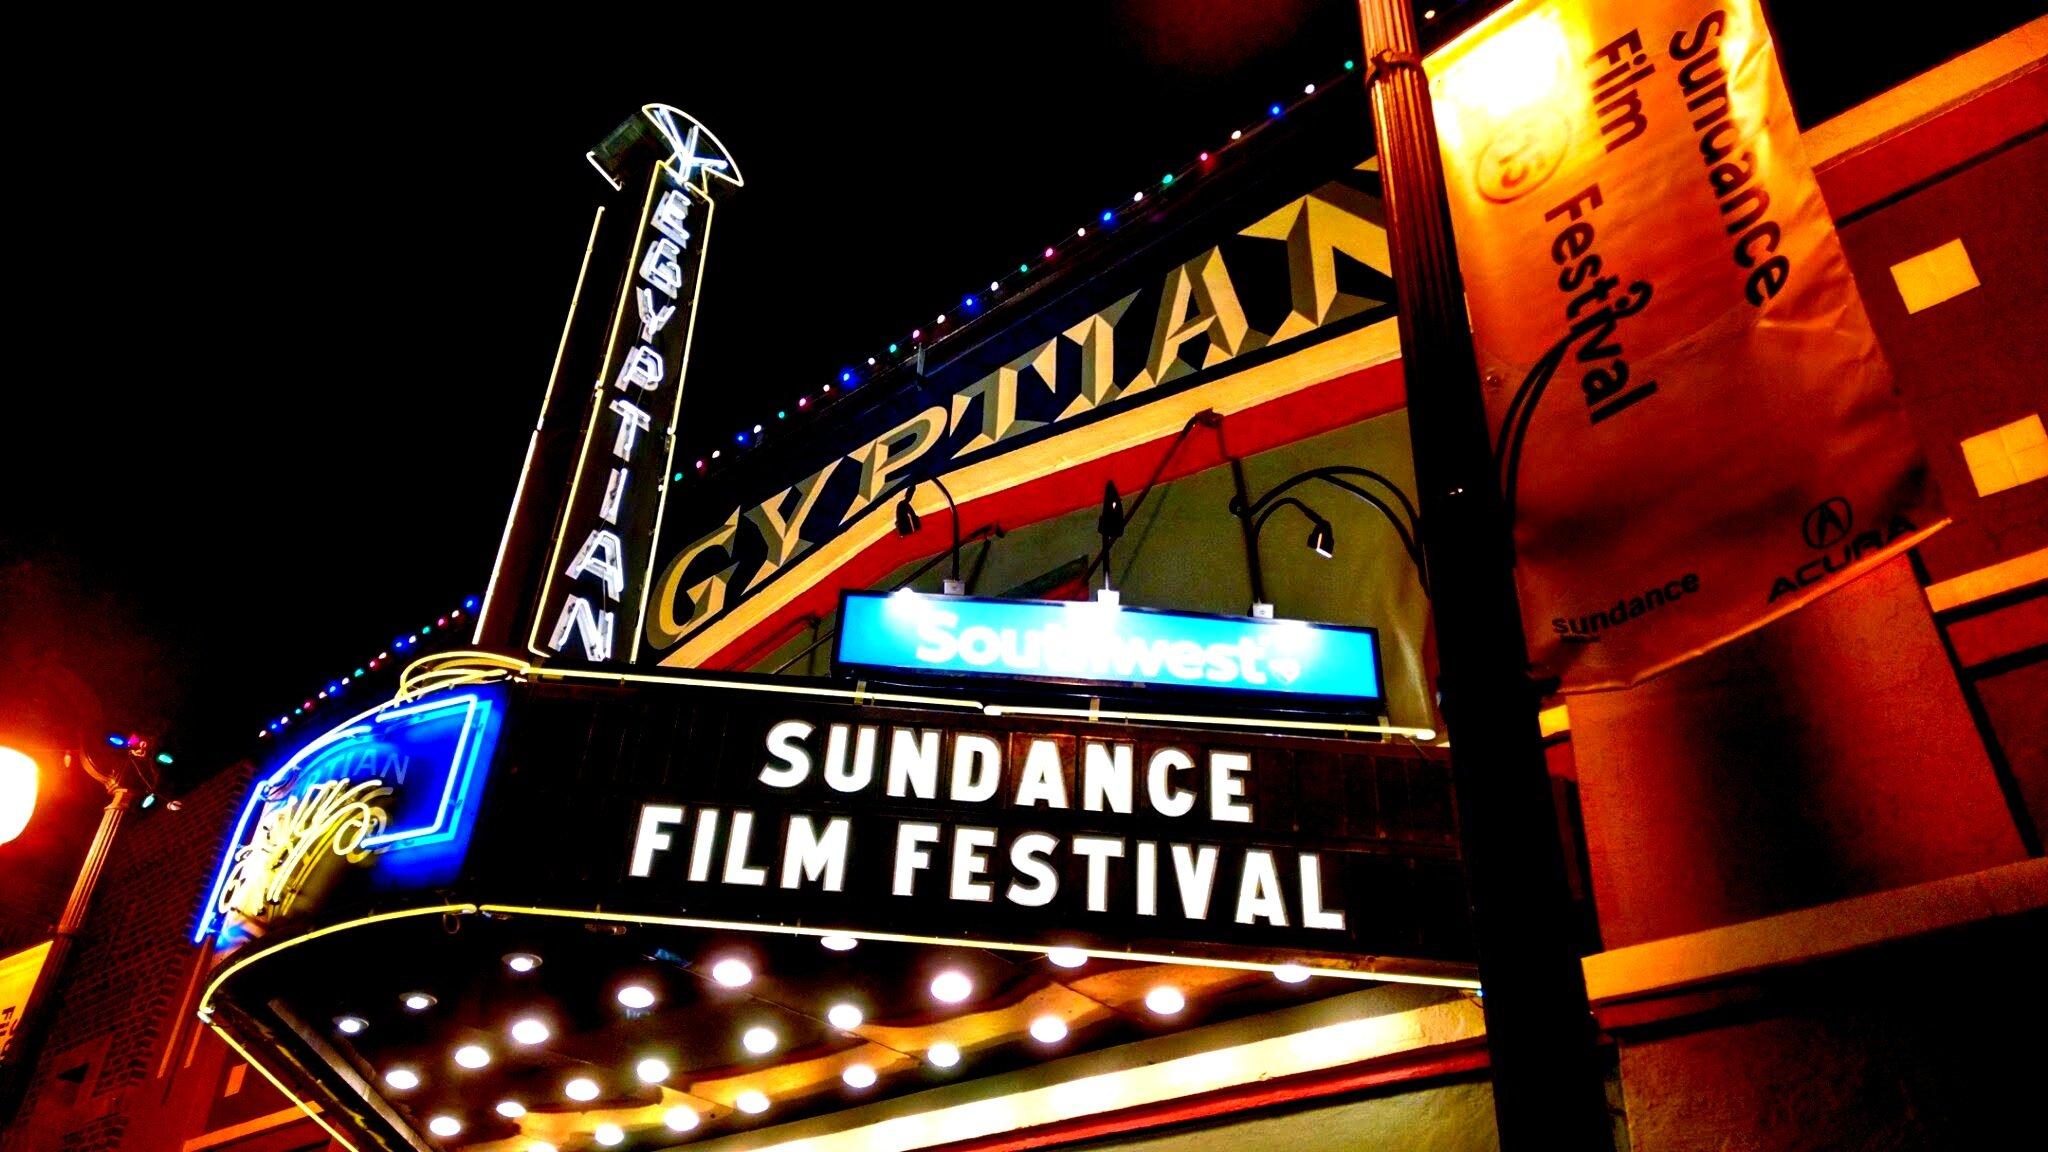 Sundance Film Festival Asia